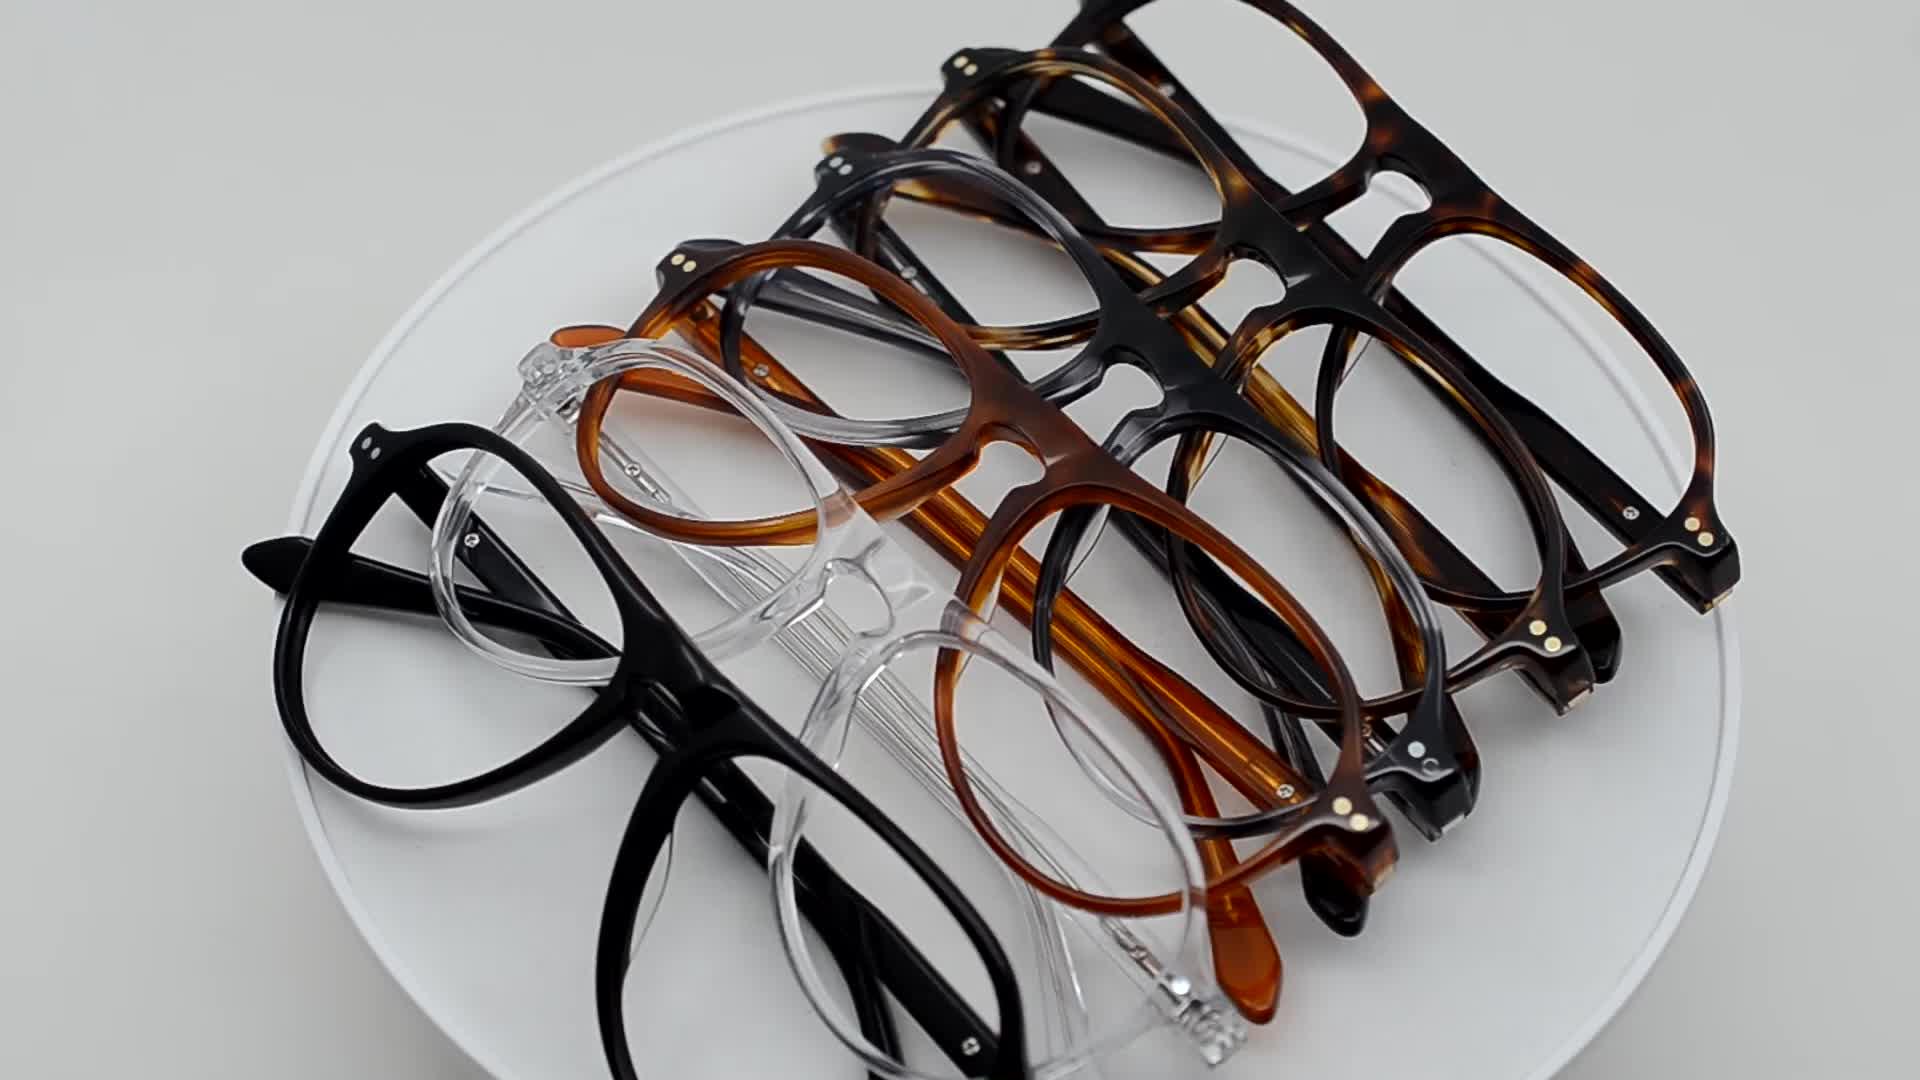 2019 FDA CE 광 eyewear blue 빛 블로킹 셀룰로오스 아세테이트 glasses